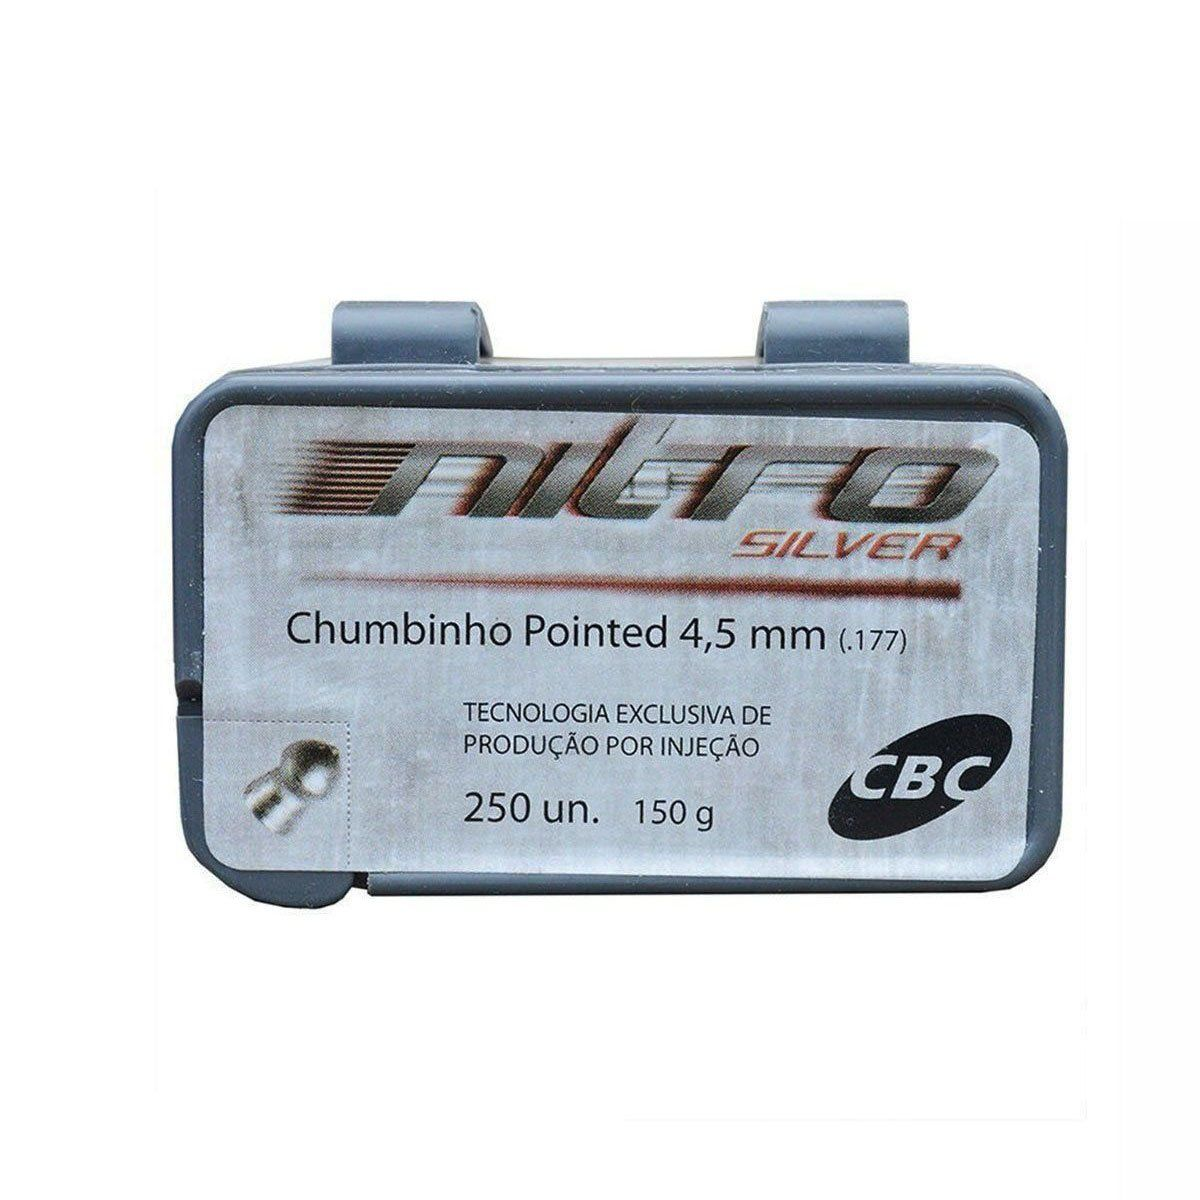 Chumbinho CBC Pointed Nitro Silver 4,5mm 250 unidades